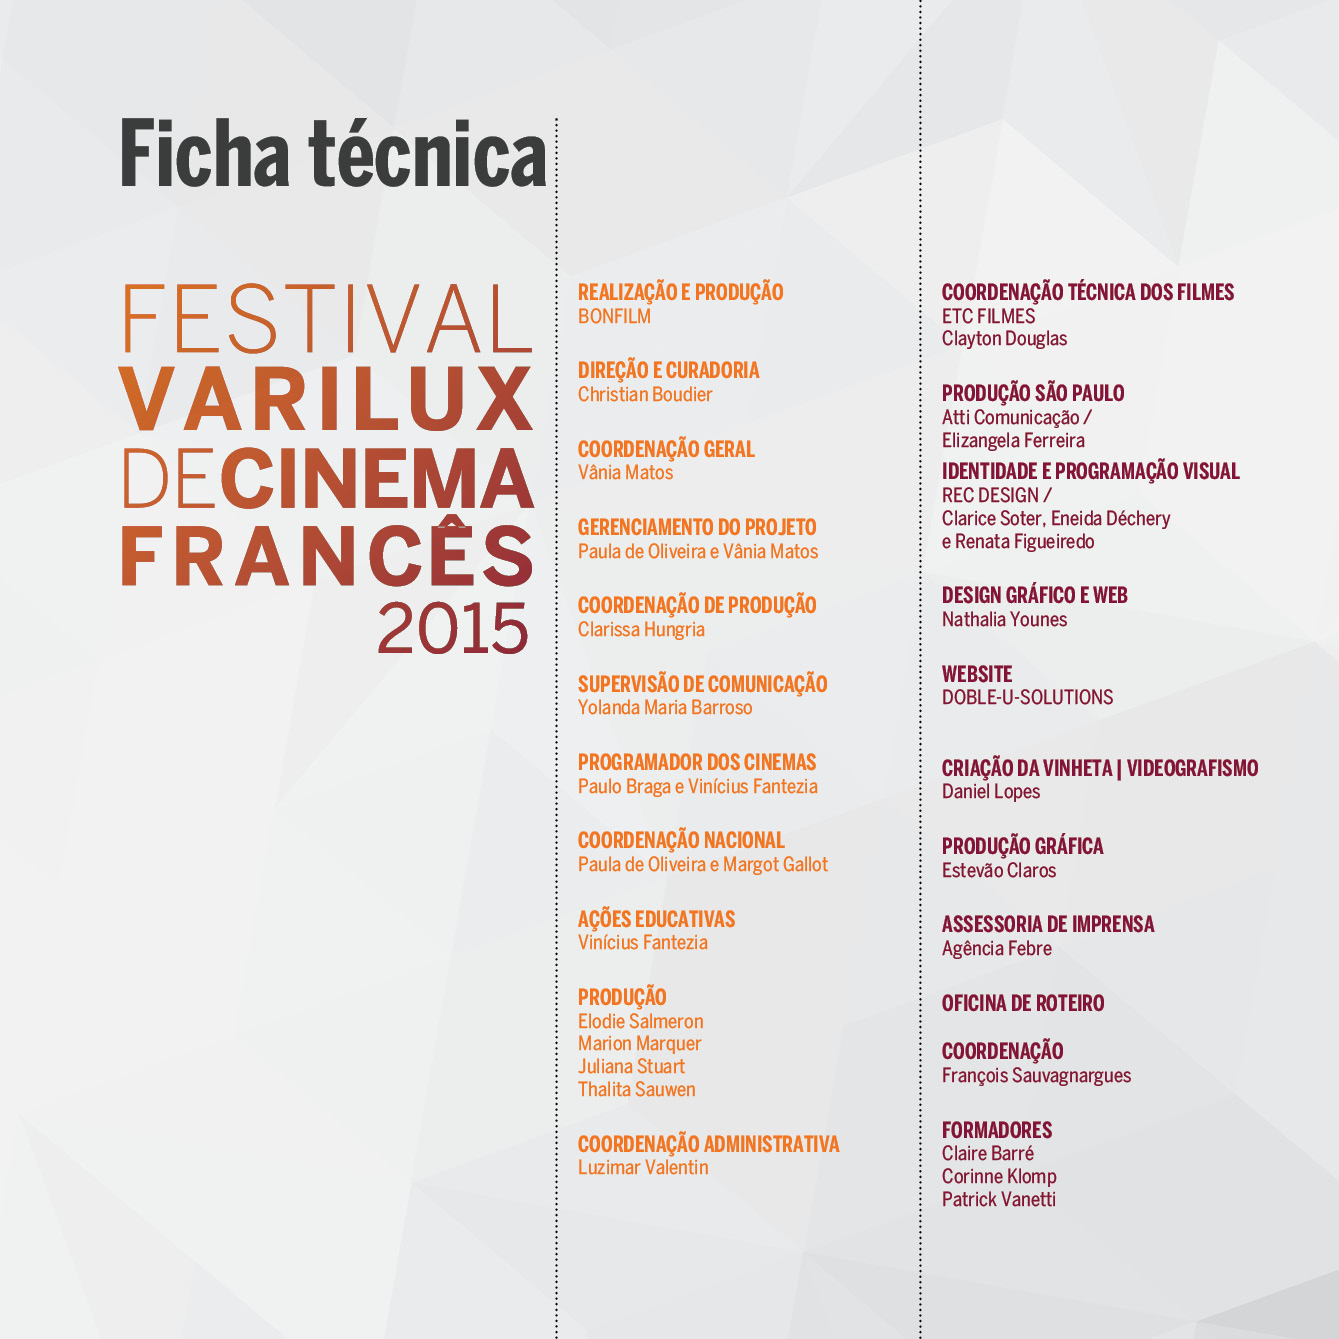 catalogovarilux_2015_fichatecnica